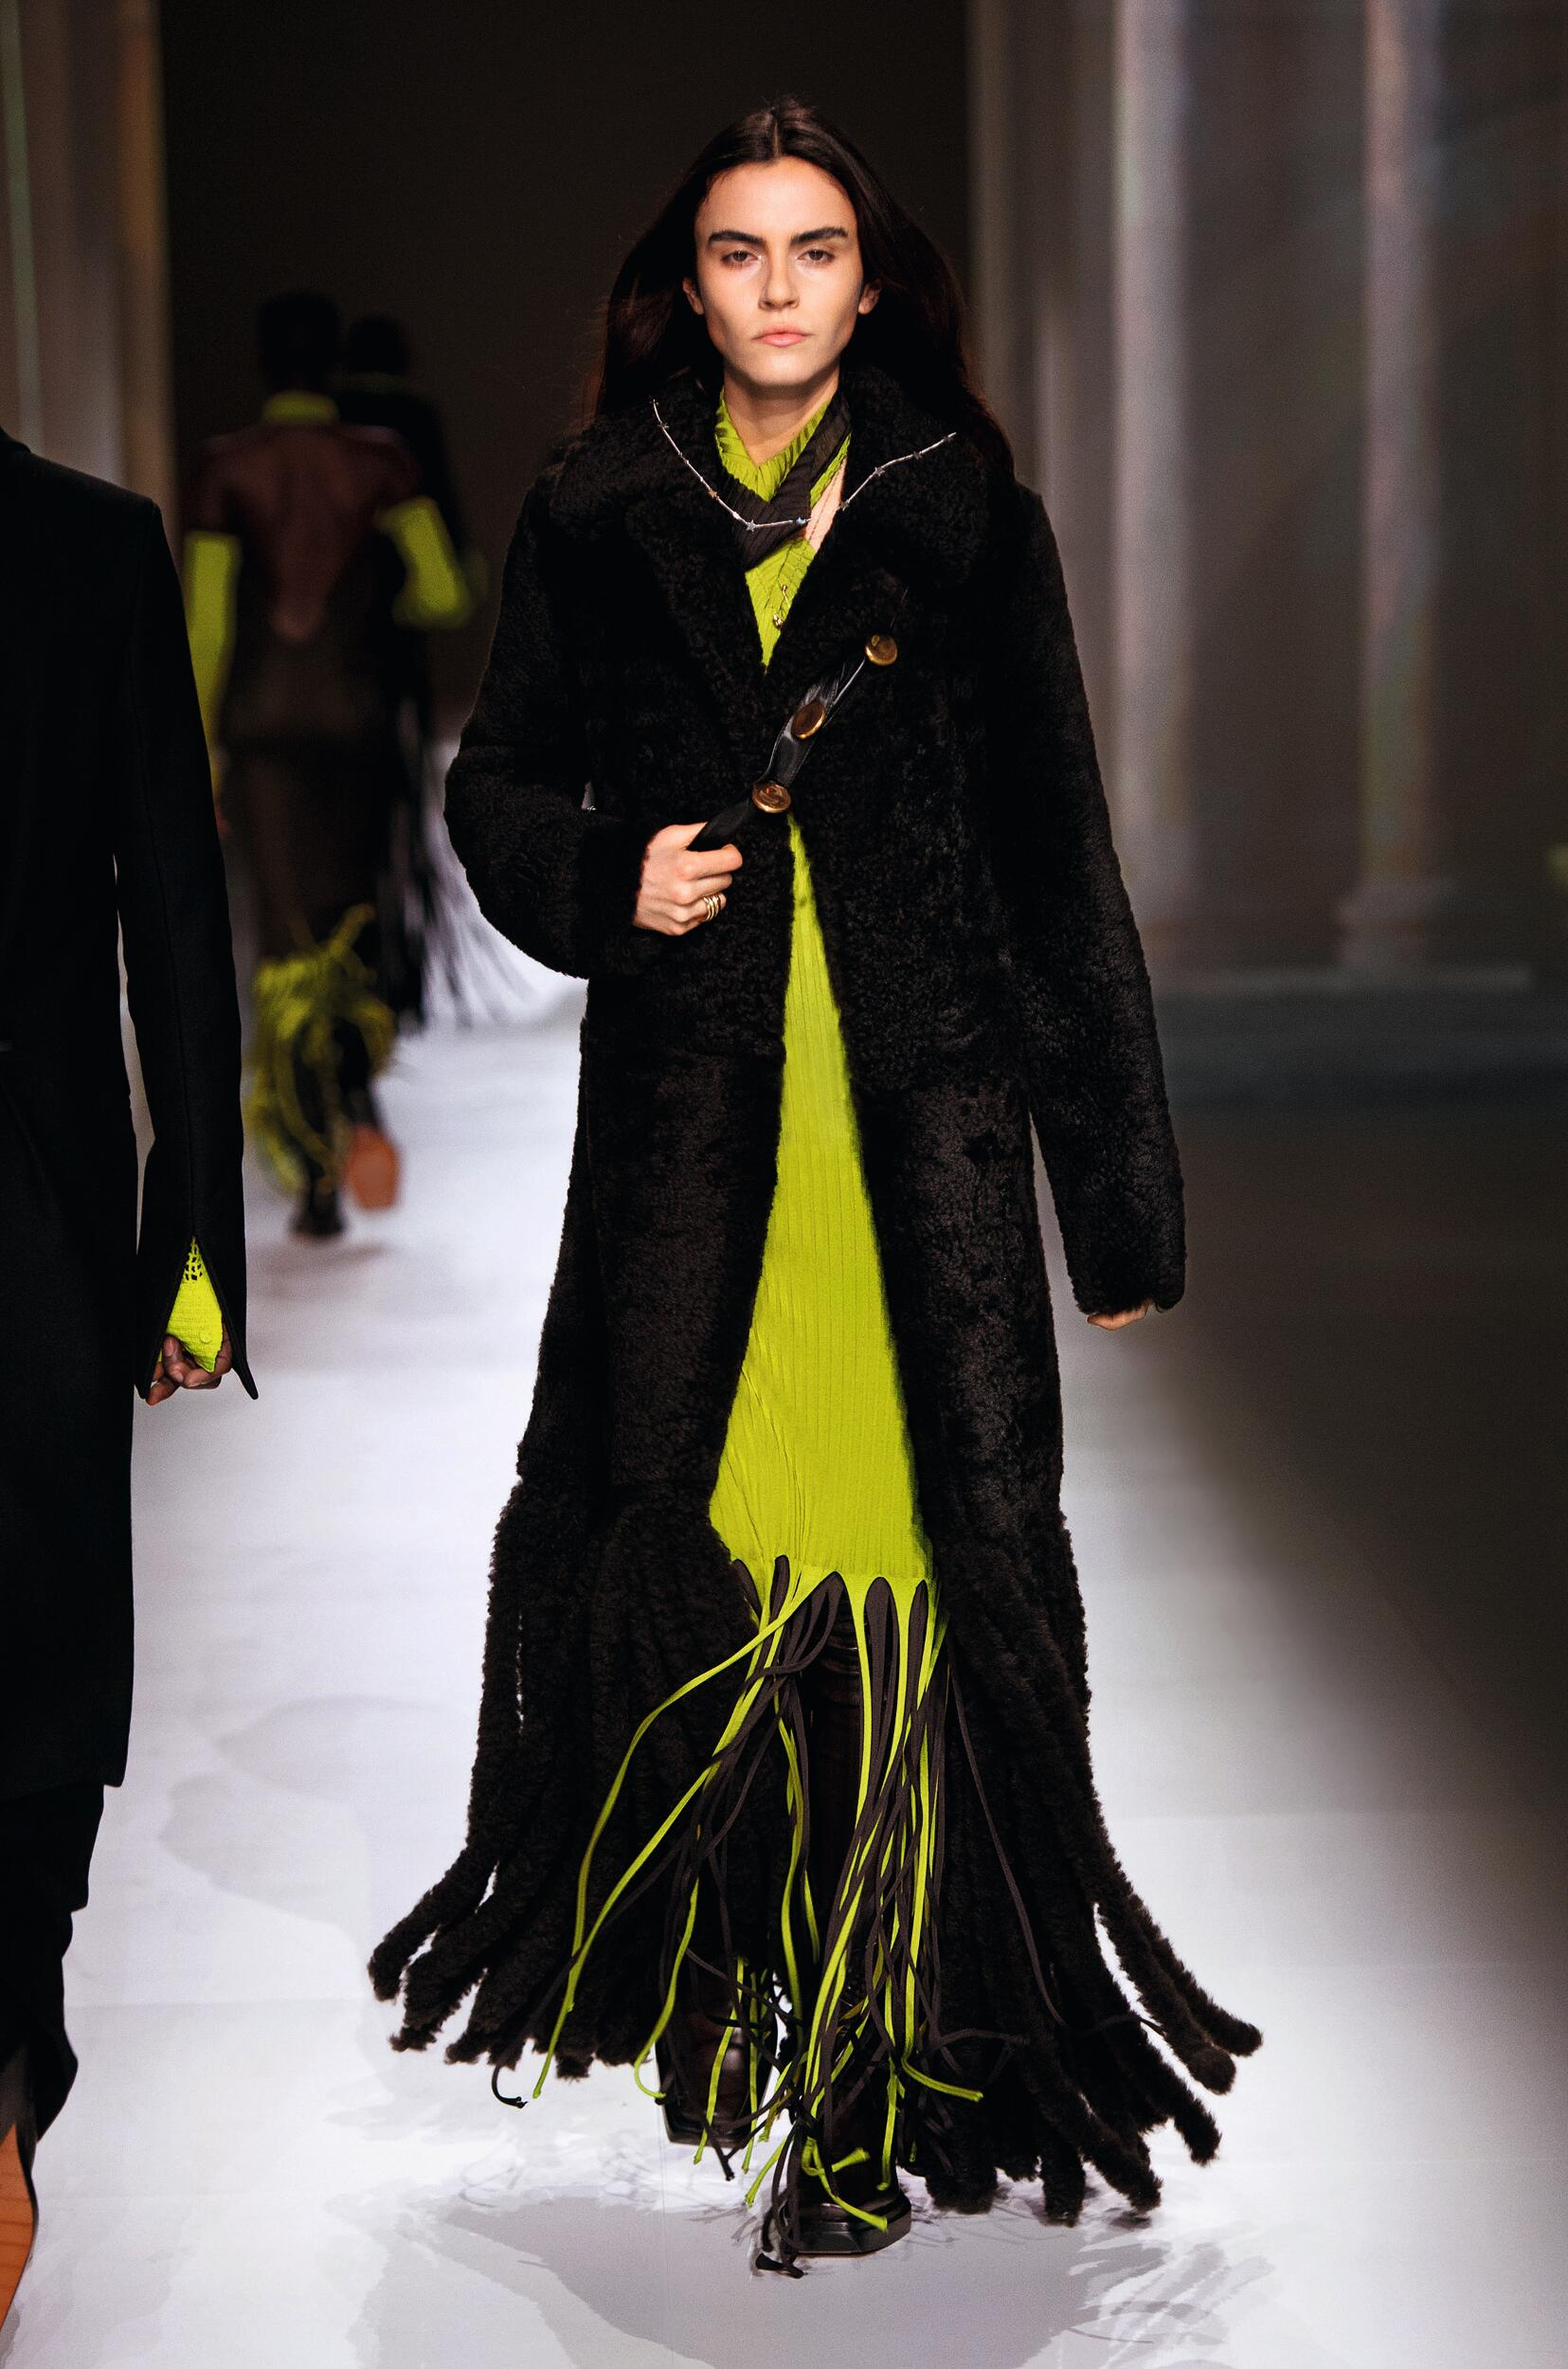 Bottega Veneta Women's Collection 2020-21